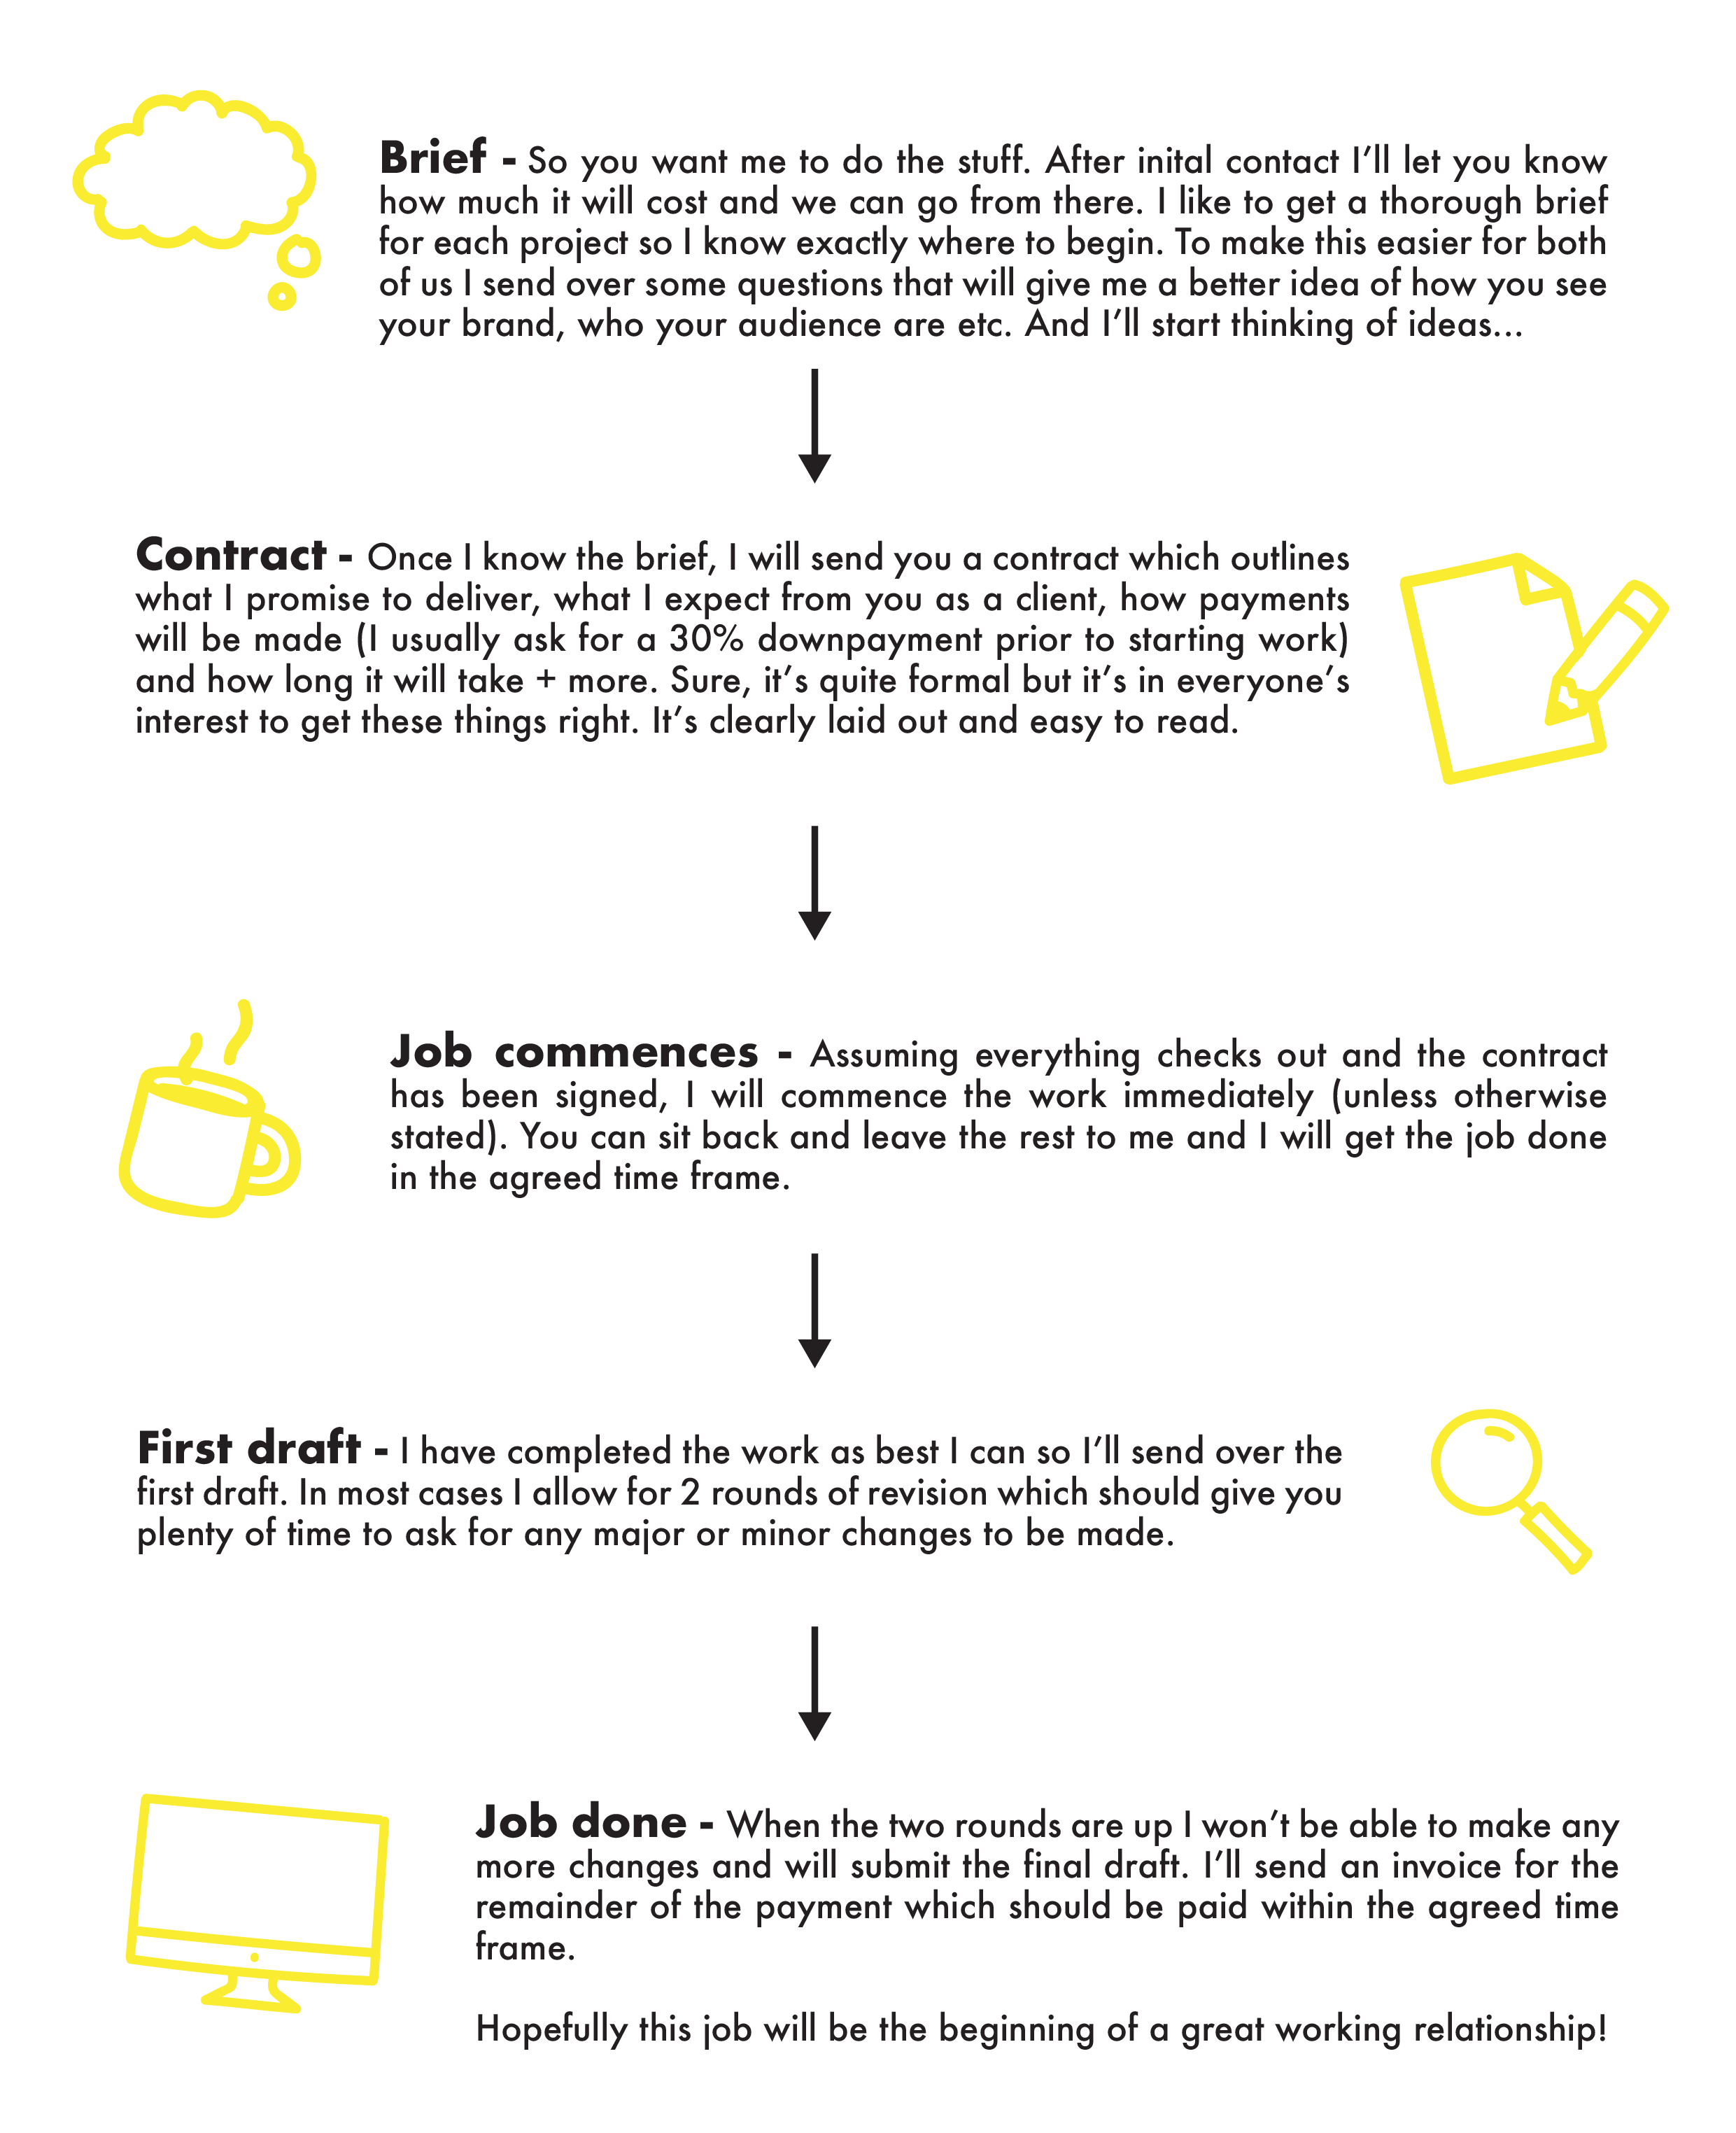 This infographic explains the freelance copywriter process.